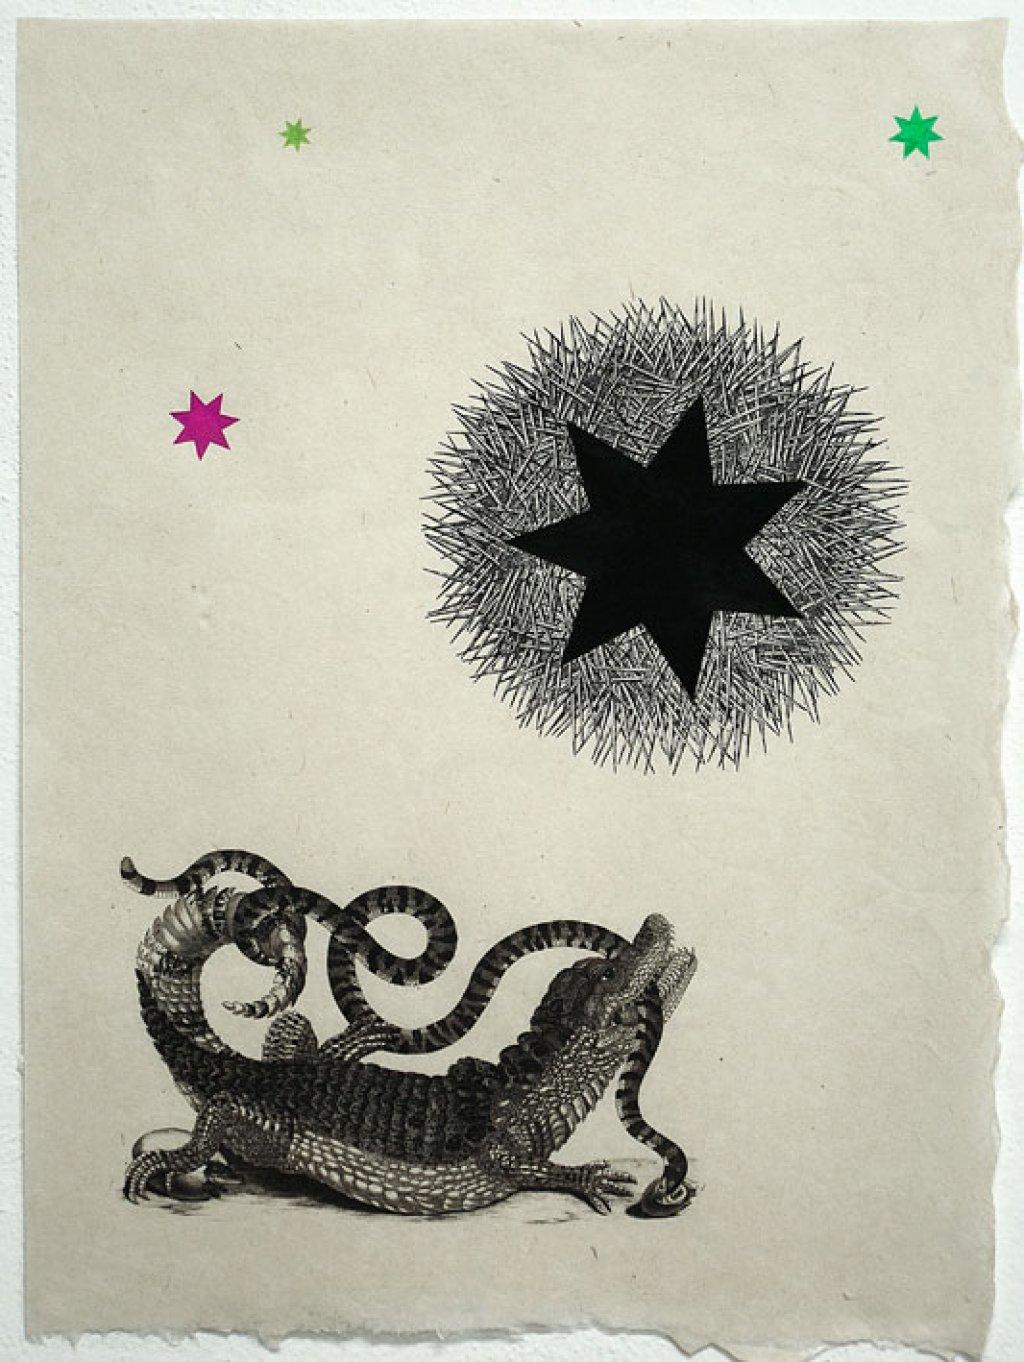 Croco Star